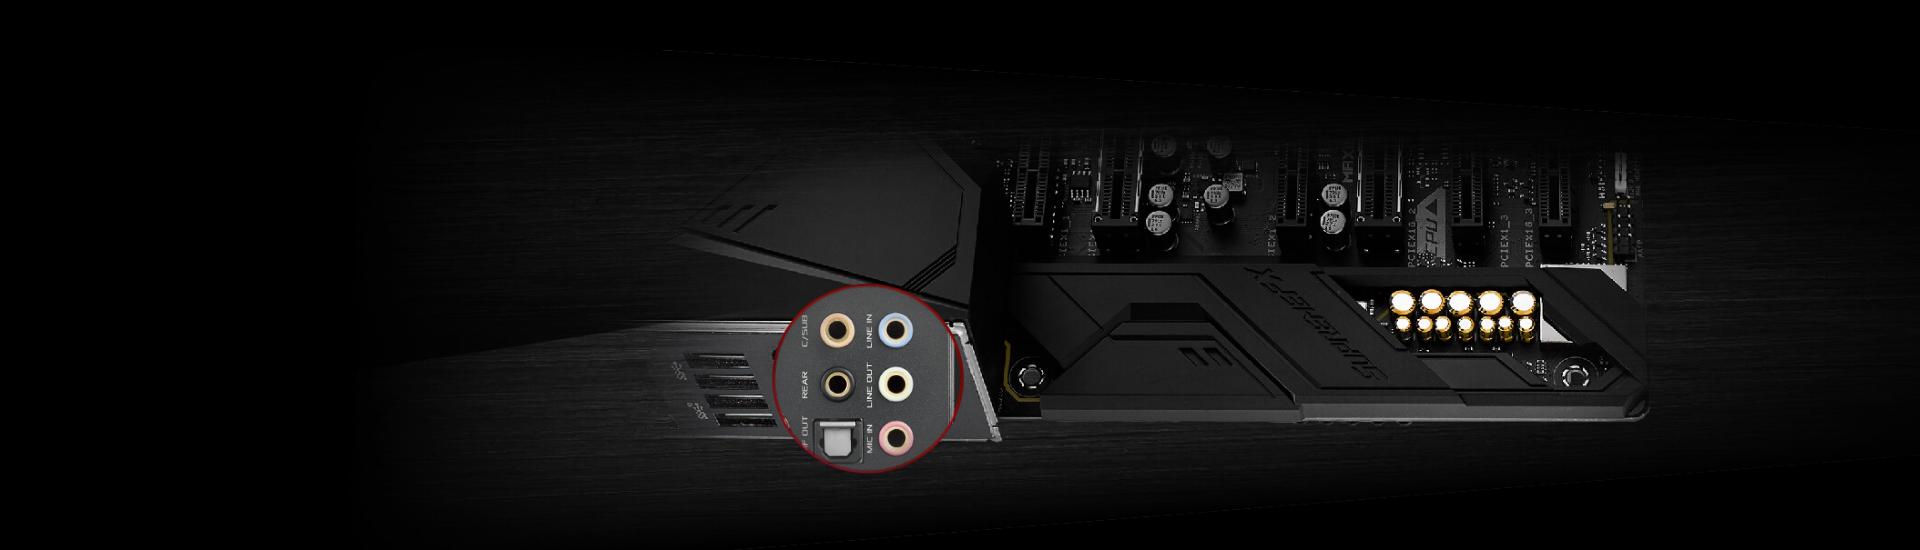 ASUS ROG Maximus XI Hero (Wi-Fi) Z390 Gaming Motherboard LGA1151 (Intel 8th  and 9th Gen) ATX DDR4 DP HDMI M 2 USB 3 1 Gen2 Onboard 802 11 ac -